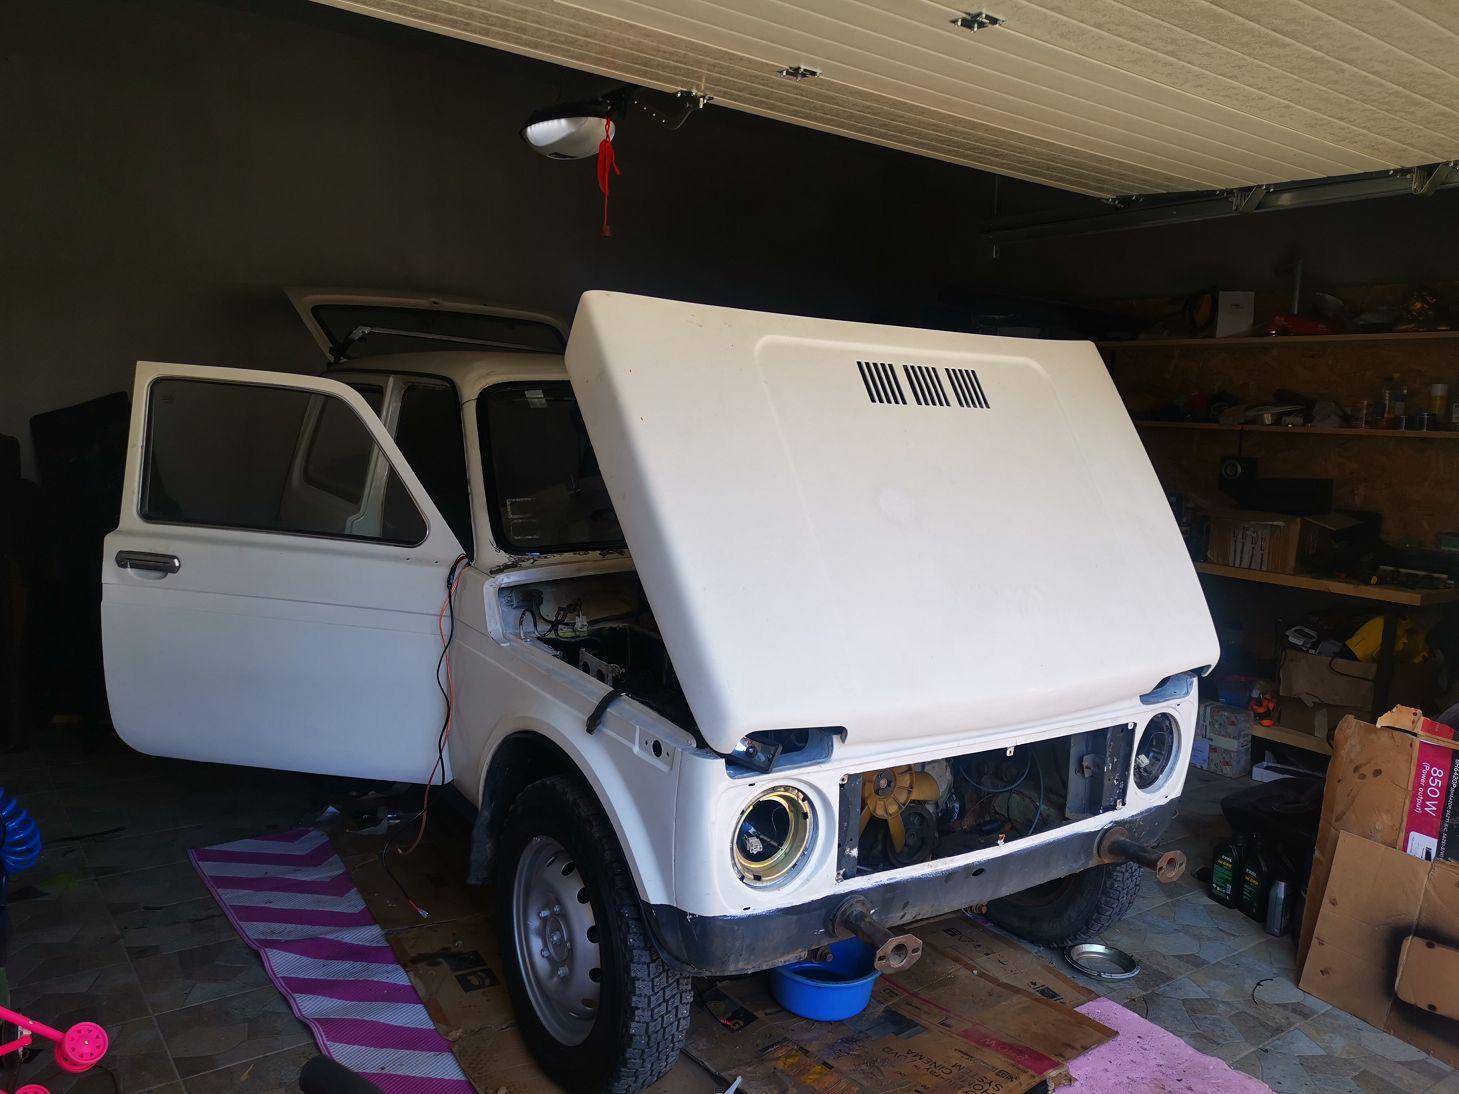 Lada Niva Projekt - Ist das Tuning